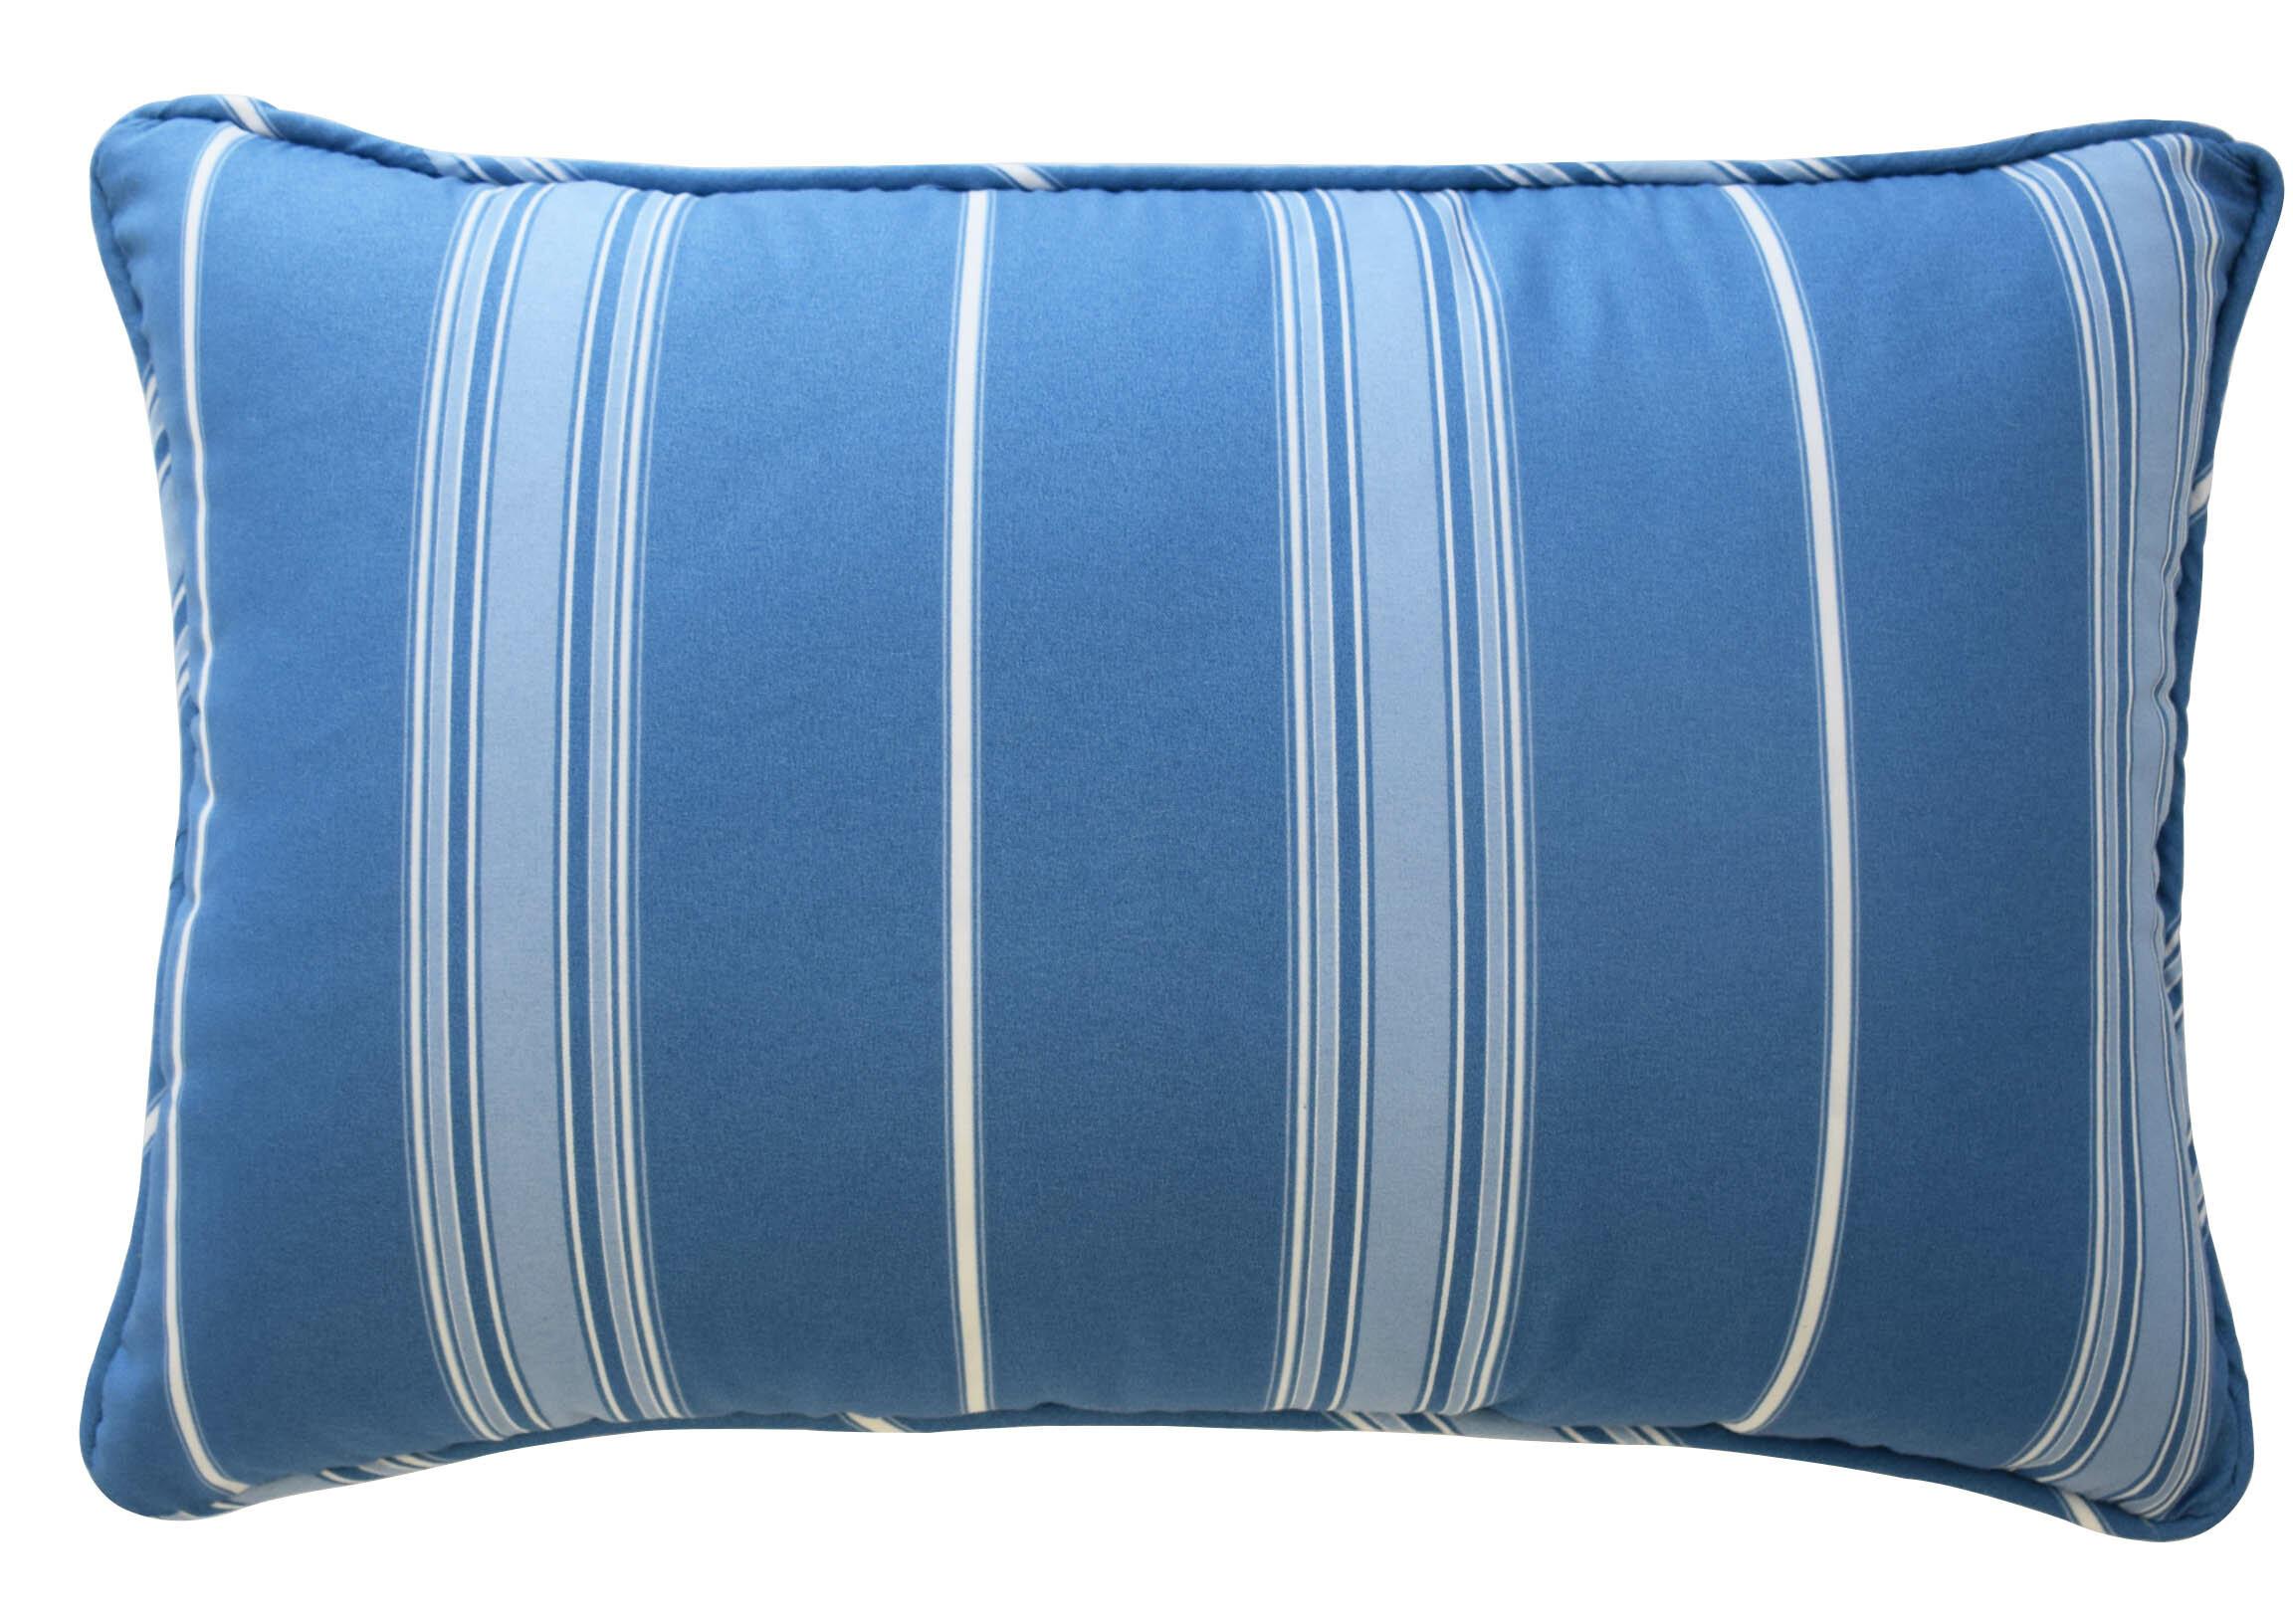 Waverly Ride The Waves Striped Polyester Lumbar Pillow Reviews Wayfair